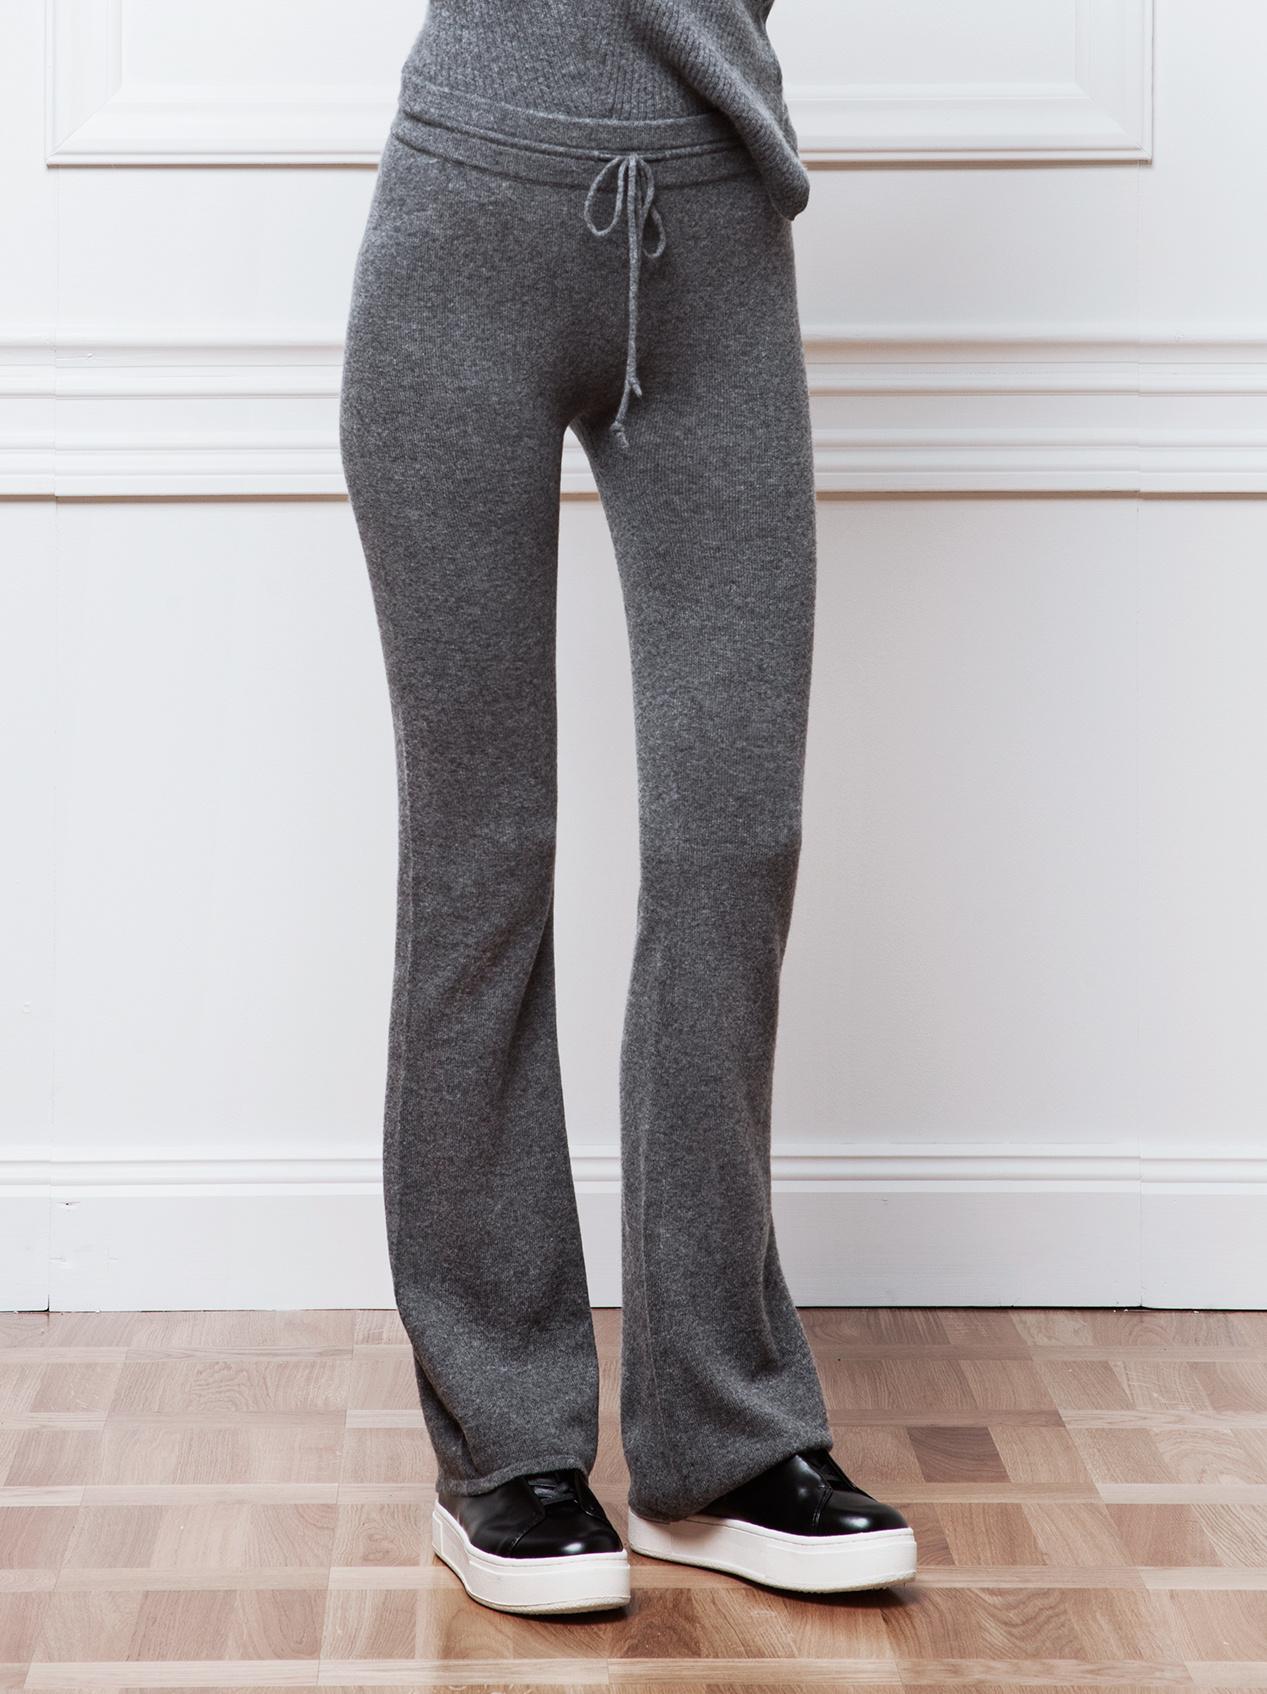 Soft Goat Women's Trumpet Pants By Petra Dark Grey